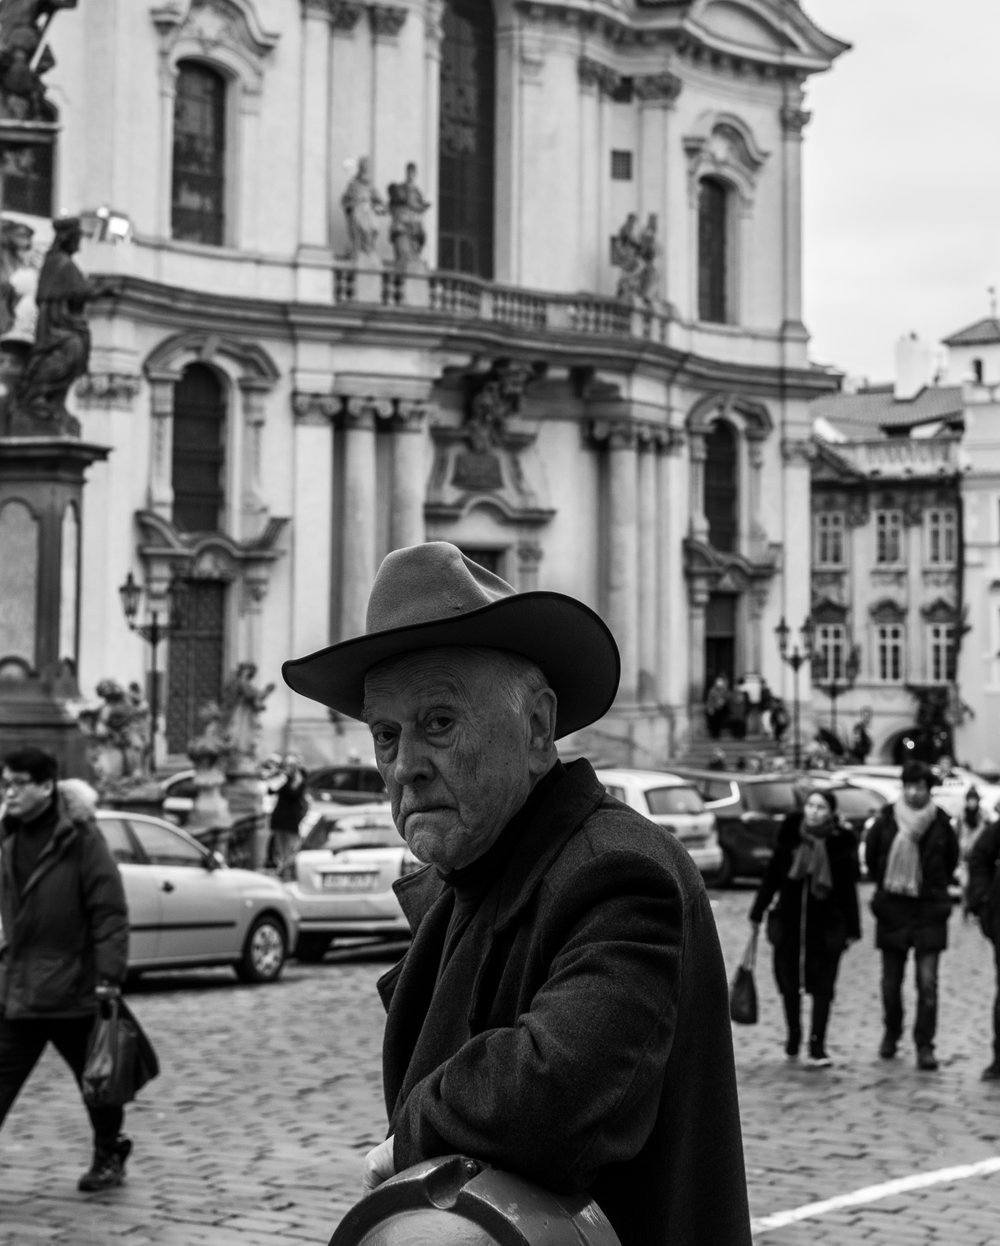 Caught Me Shooting! - Prague, Czech Republic